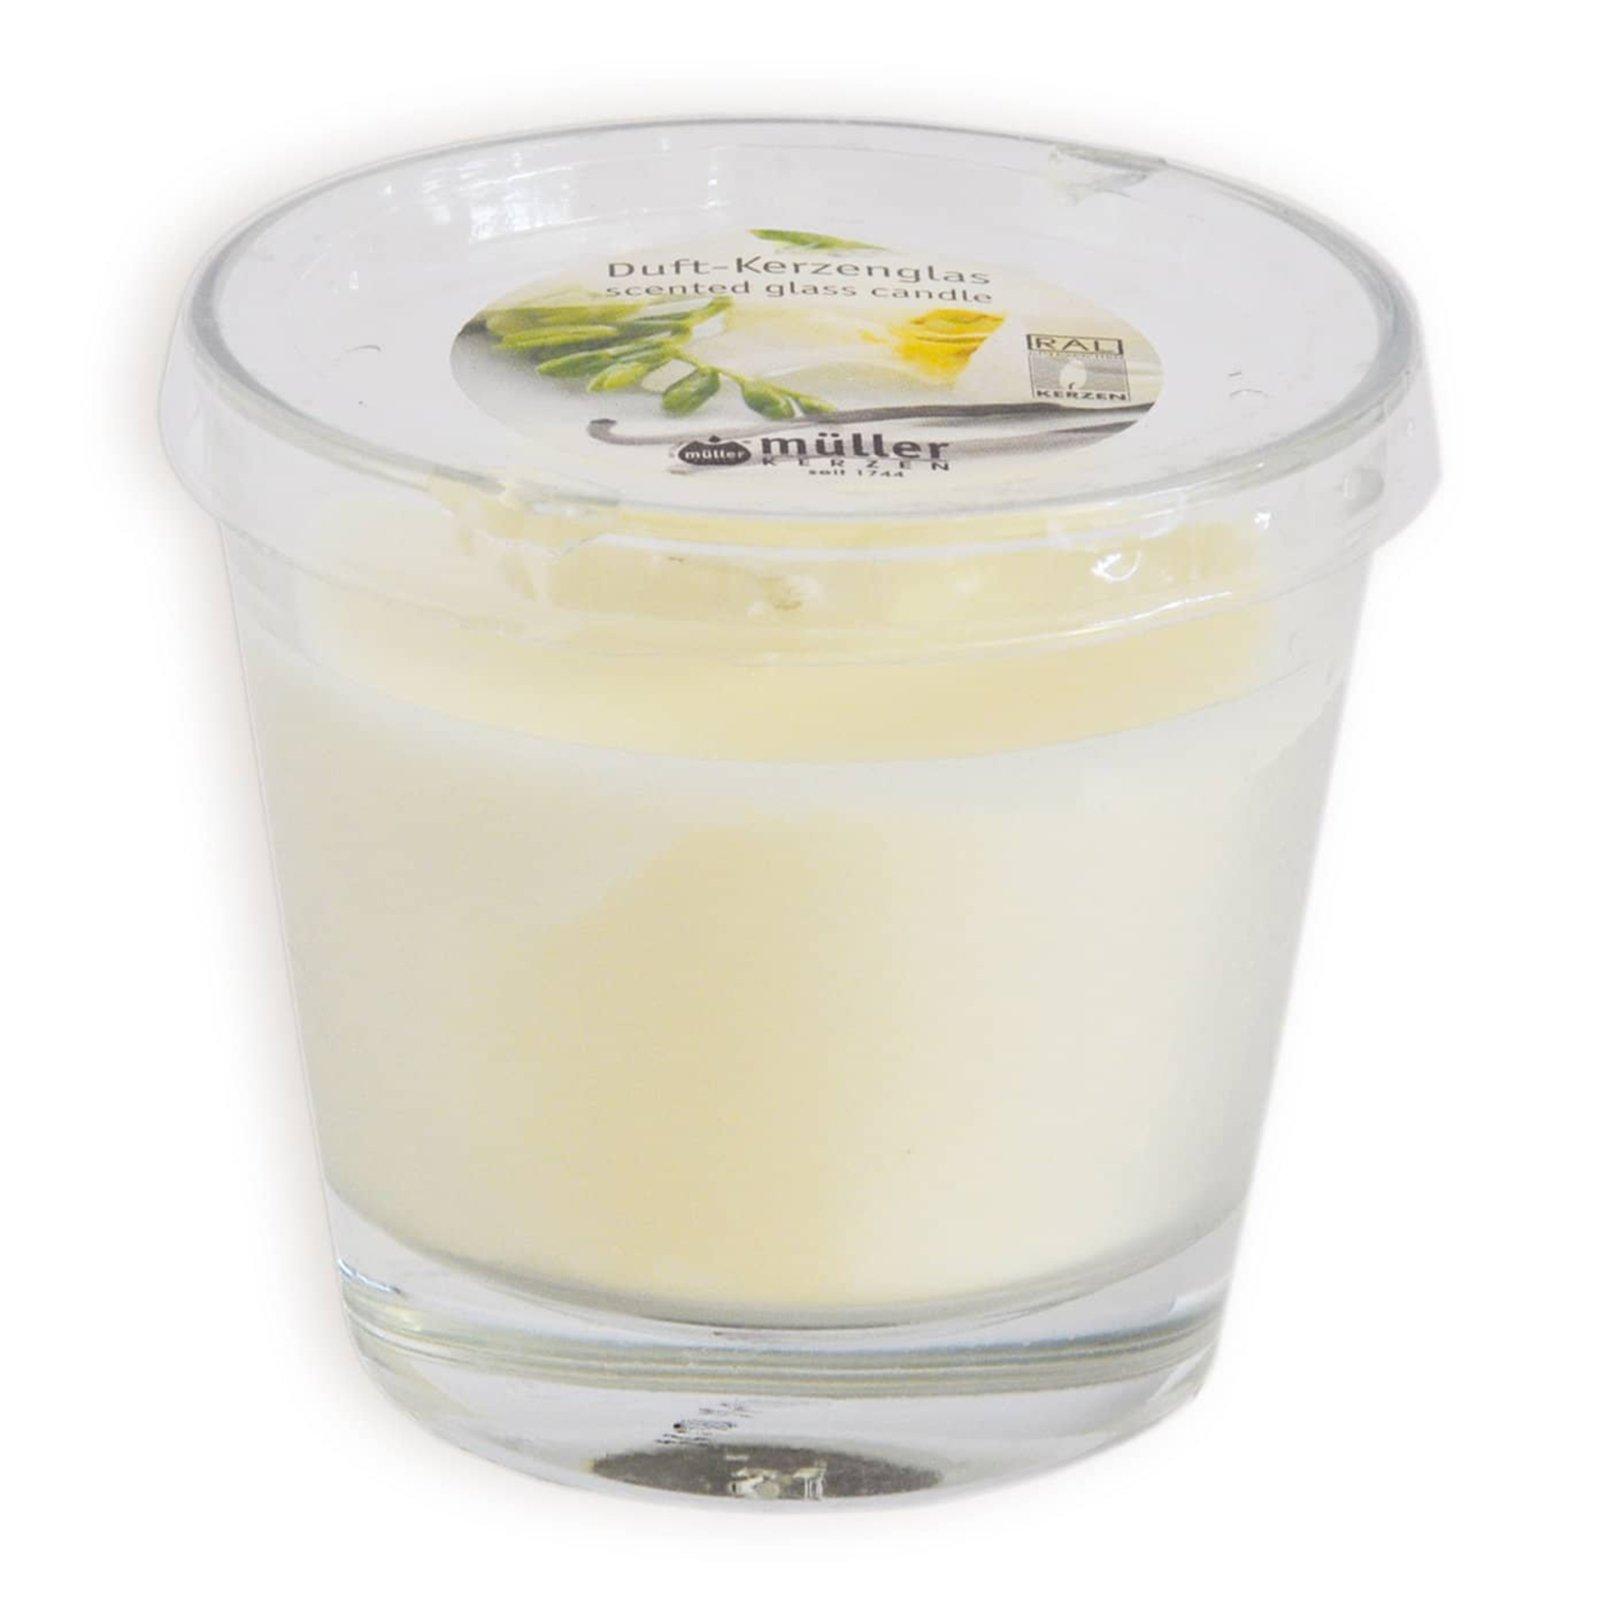 Duftkerze - Vanille - im Glas - Ø 9 cm